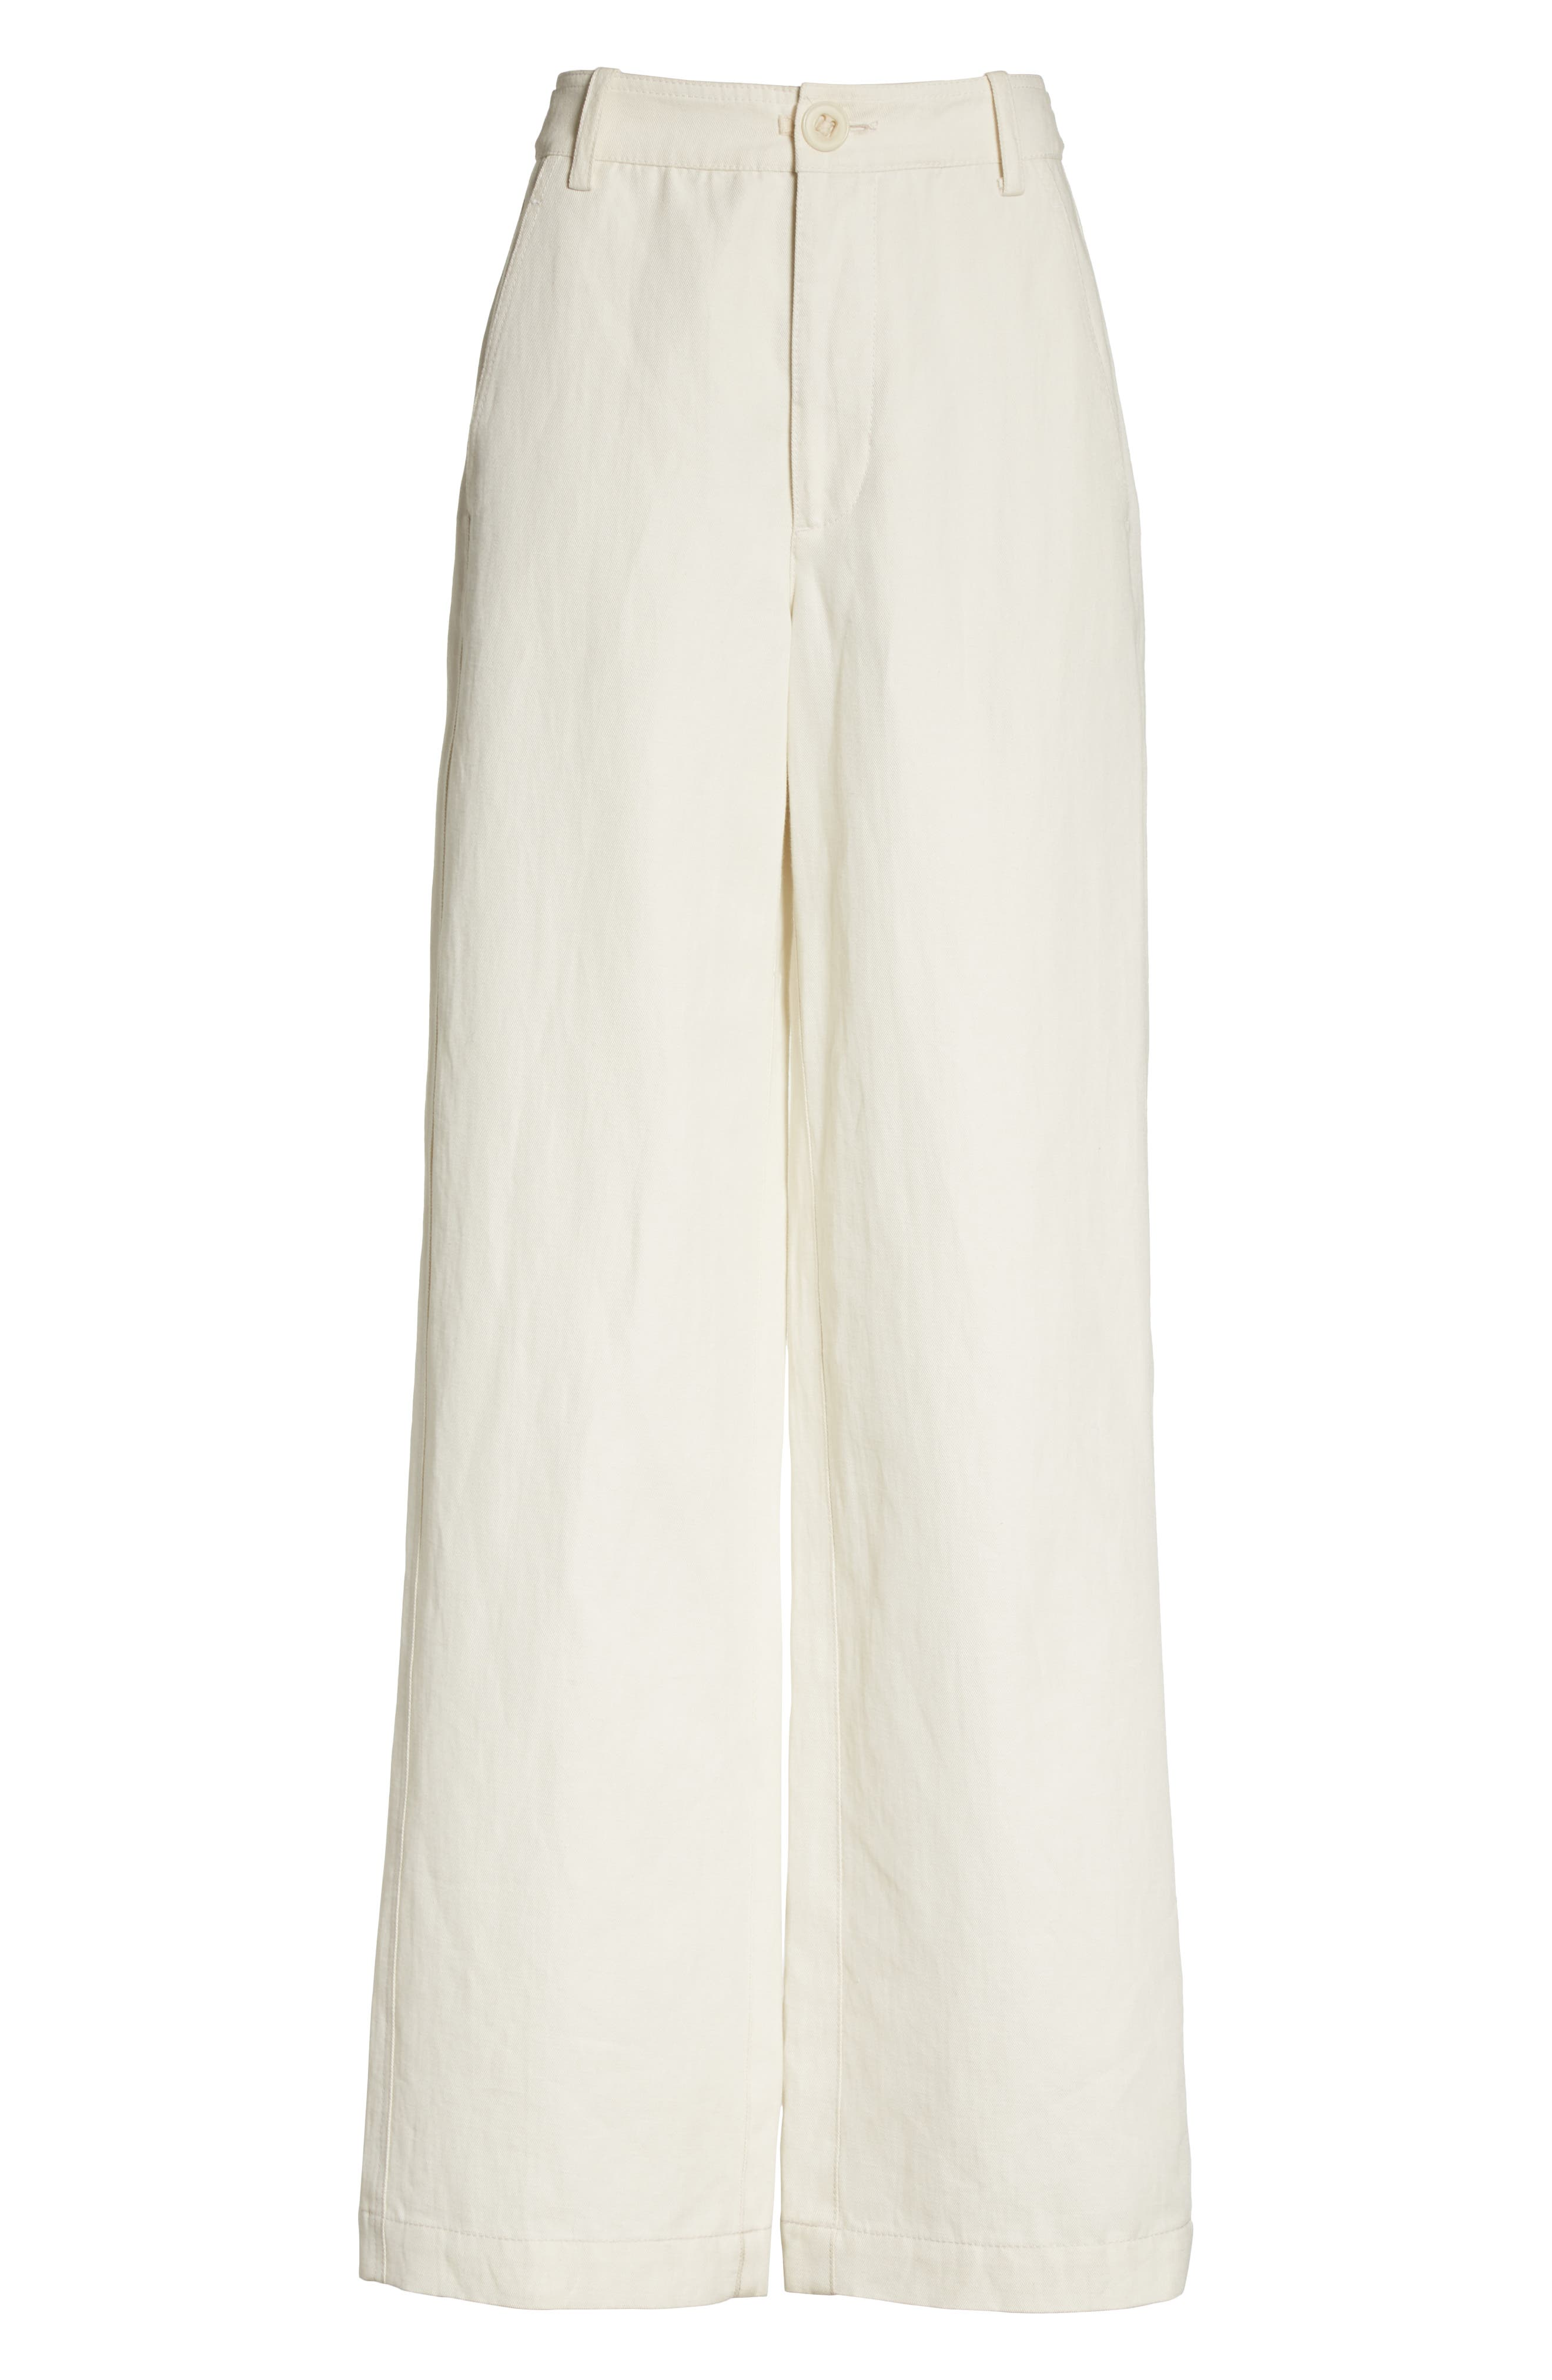 High Rise Linen Blend Wide Leg Pants,                             Alternate thumbnail 7, color,                             Gardenia